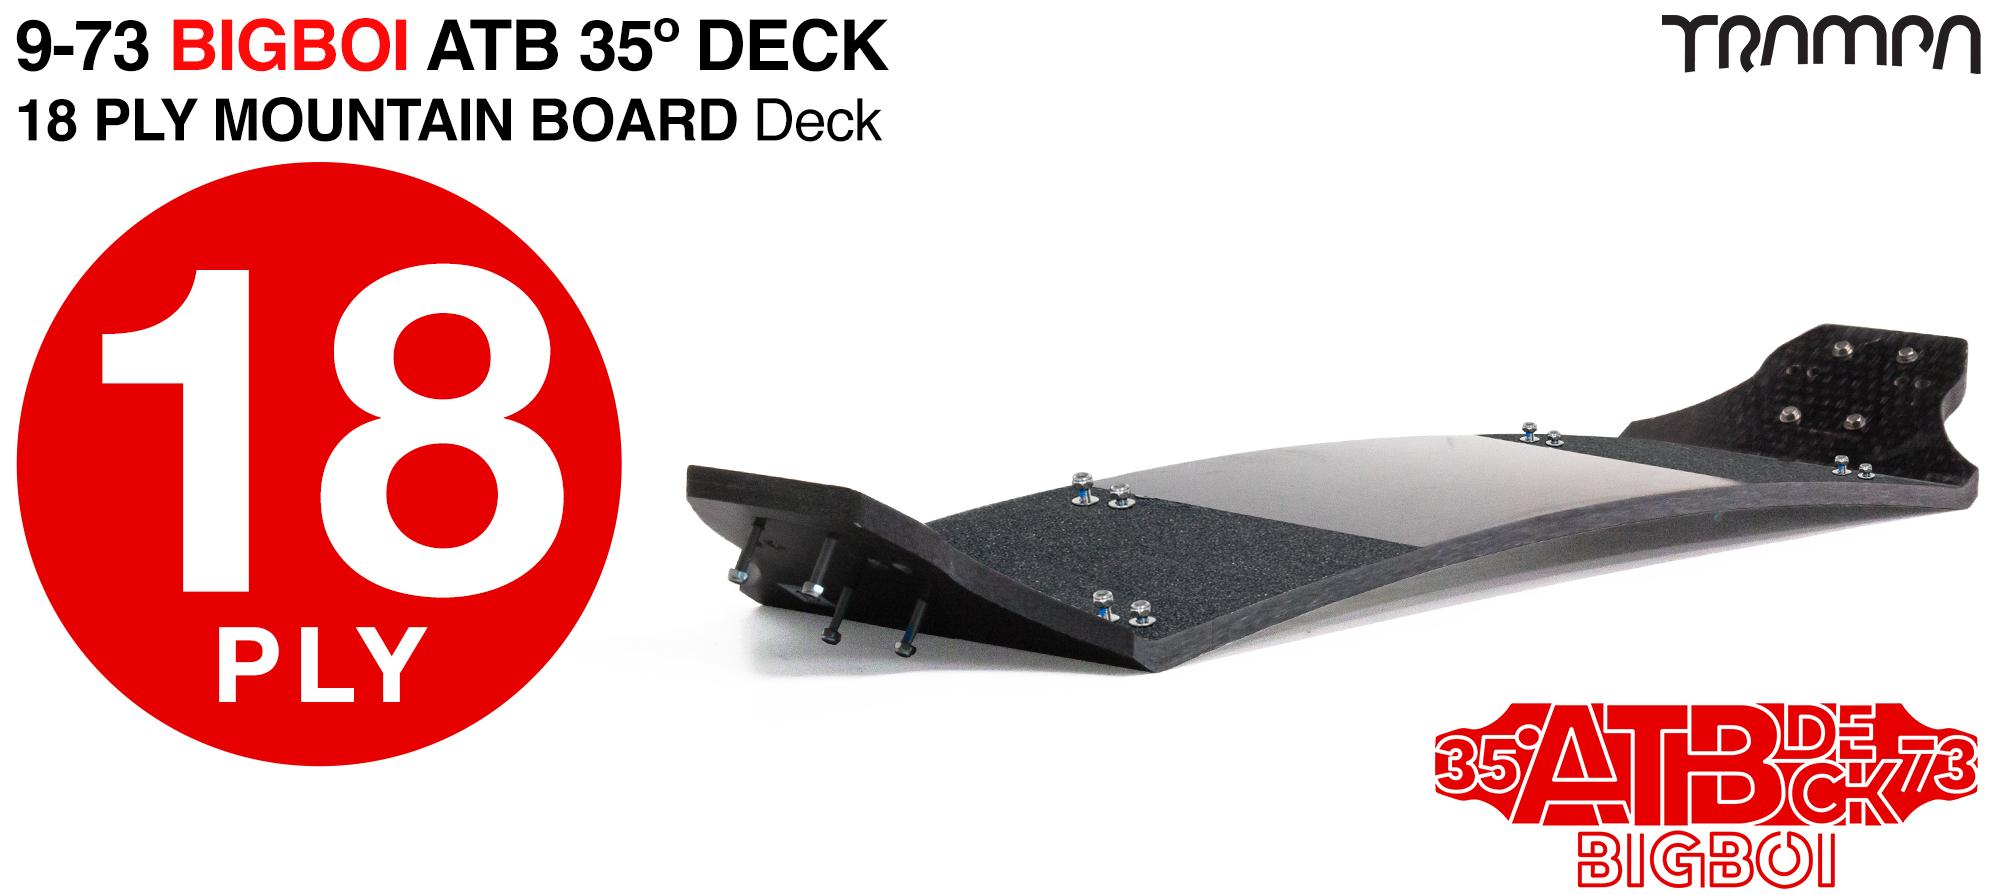 18ply 9-73 35º Gripped Mountainboard Deck - STIFFEST